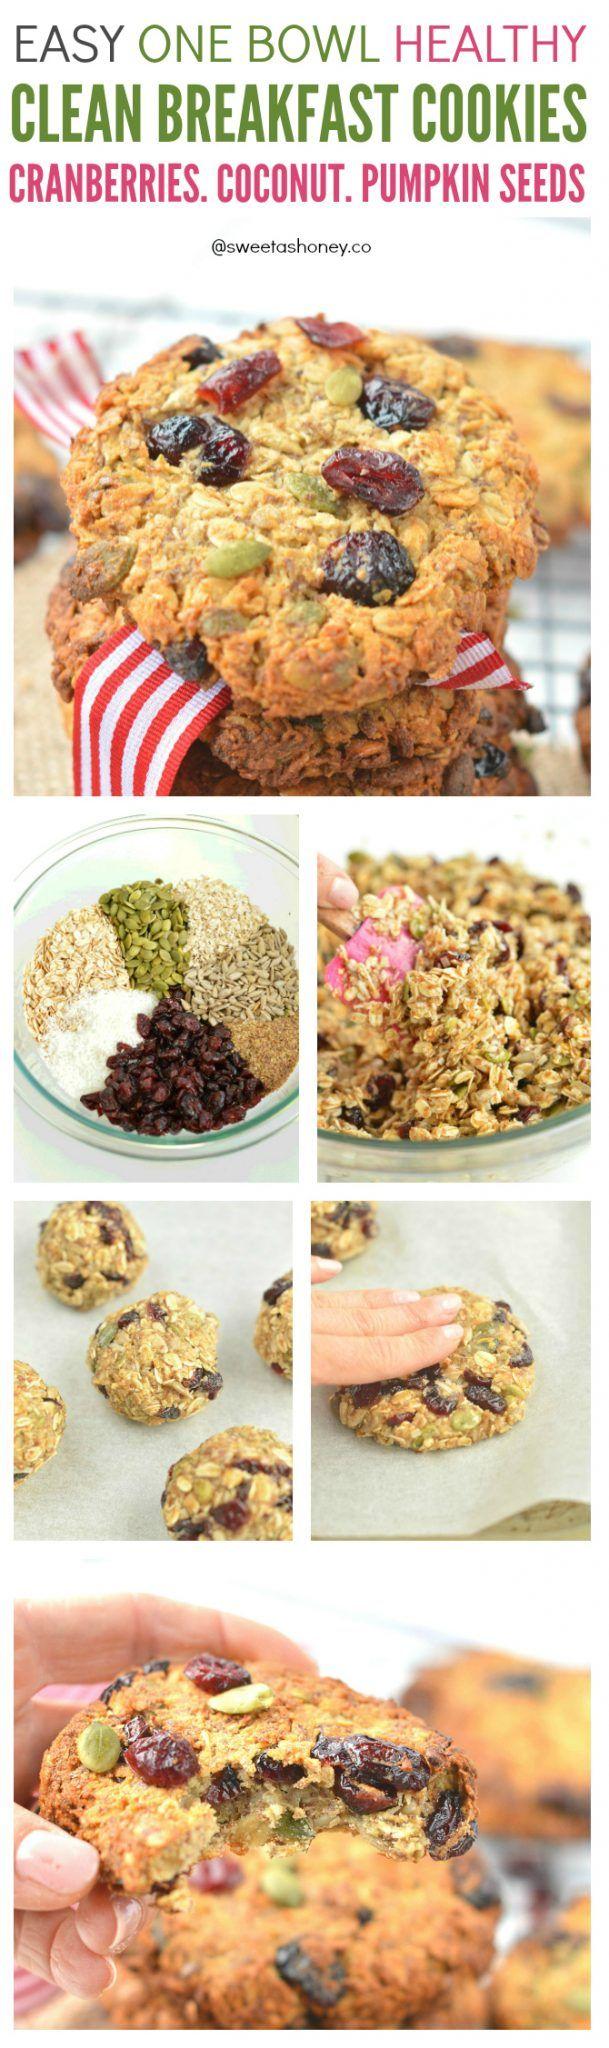 Easy Clean Breakfast Cookies with cranberries coconut pumpkin seeds. A healthy grab & go breakfast.